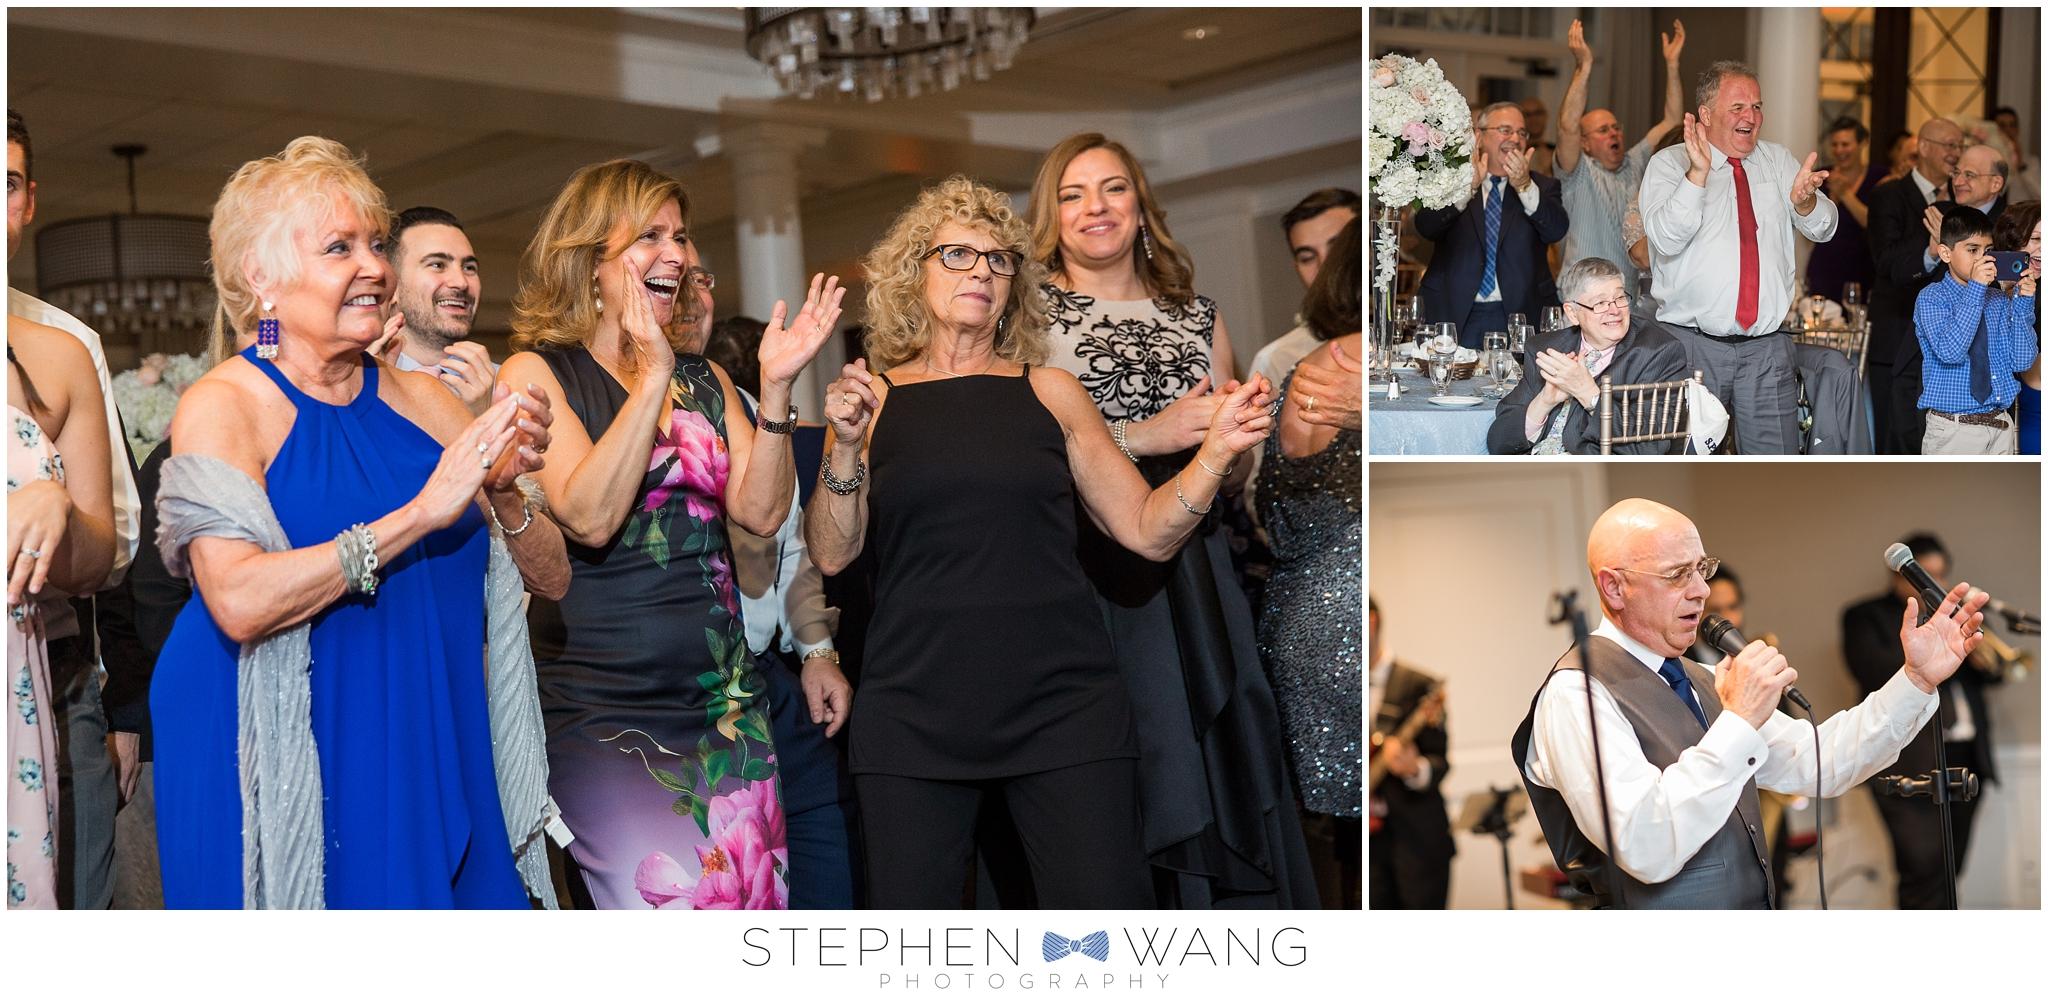 Stephen Wang Photography Shorehaven Norwalk CT Wedding Photographer connecticut shoreline shore haven - 37.jpg